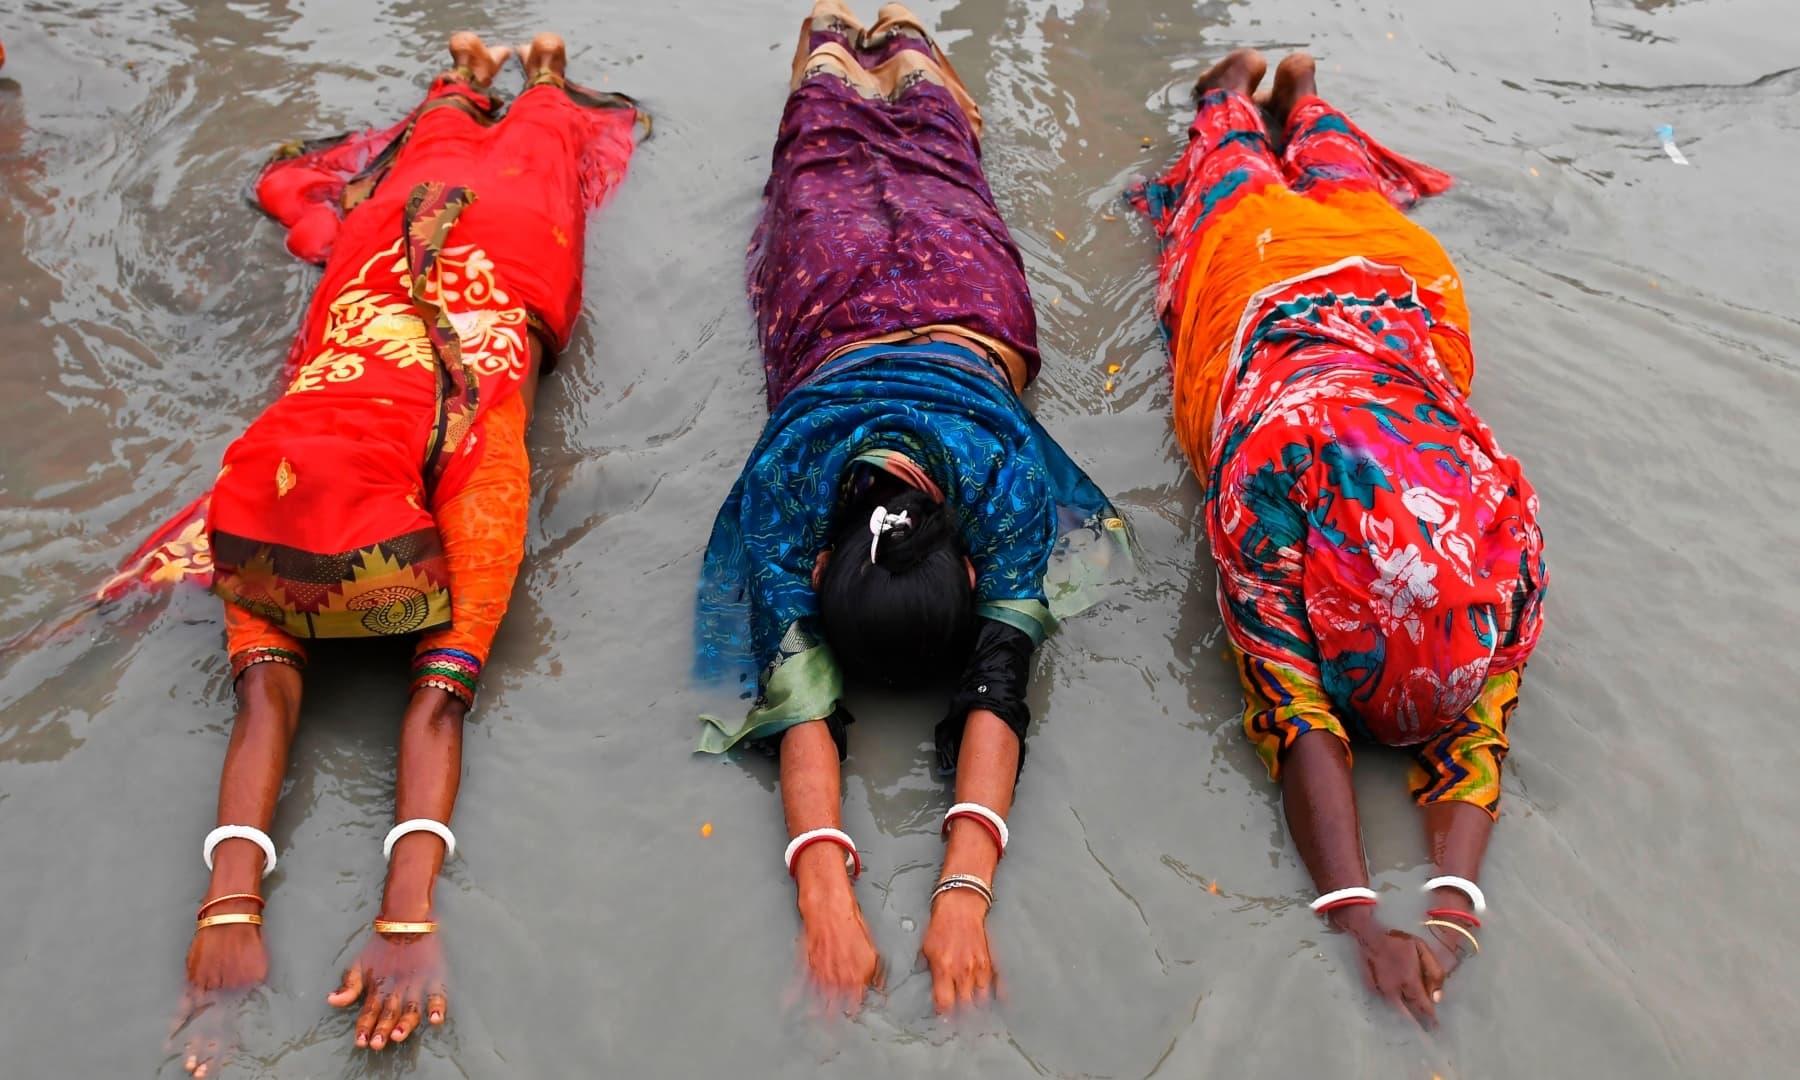 Hindu pilgrims offer prayers at the confluence of the Ganges and the Bay of Bengal during the Gangasagar Mela on the occasion of Makar Sankranti, at Sagar Island south of Kolkata on January 14. — AFP